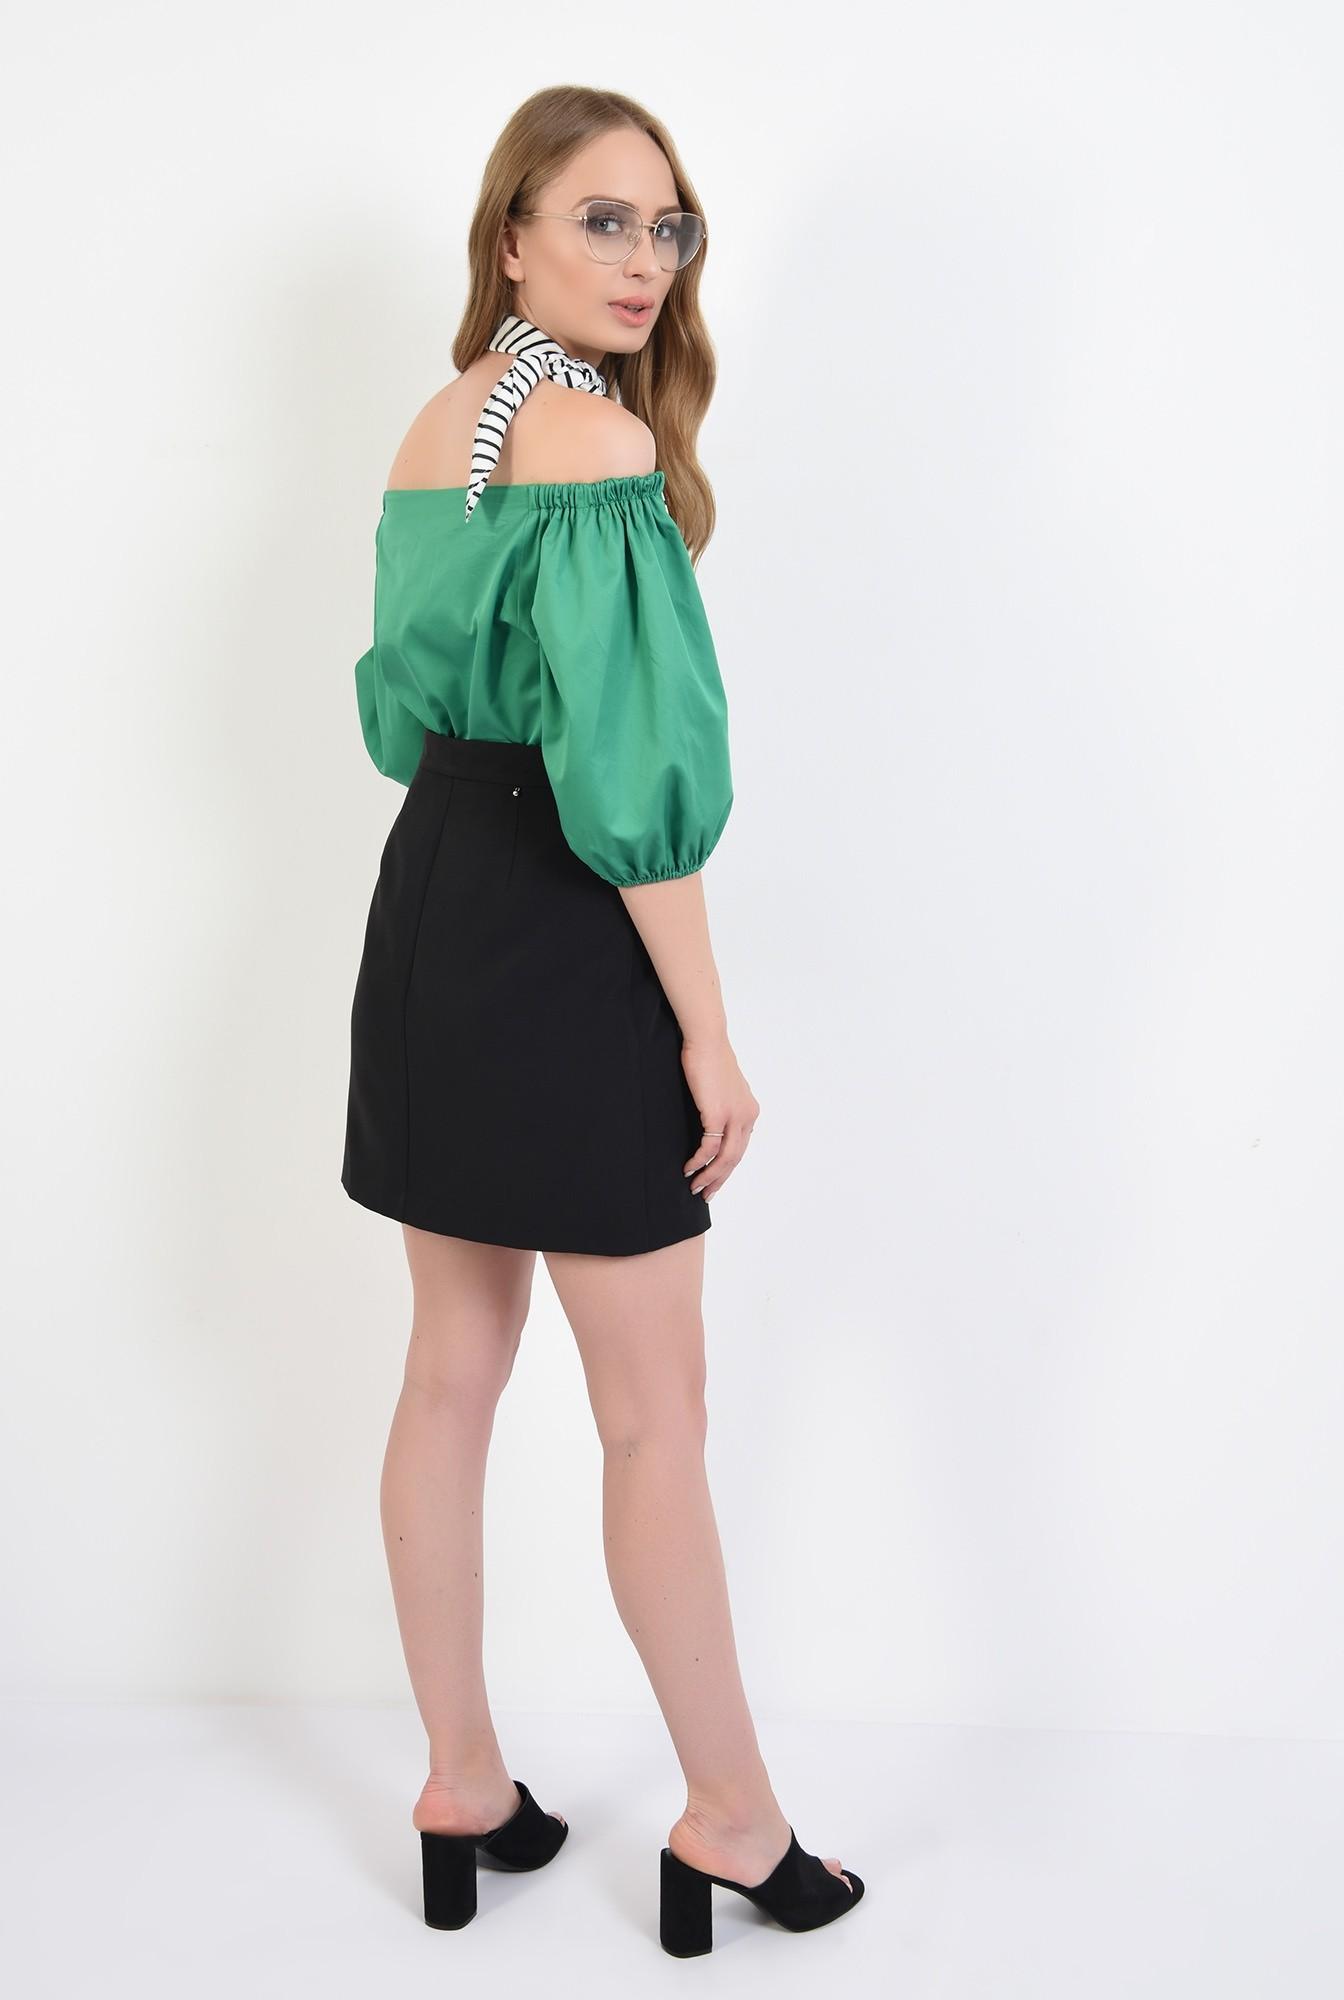 1 - 360 - bluza din bumbac, cu nasturi, verde, Poema